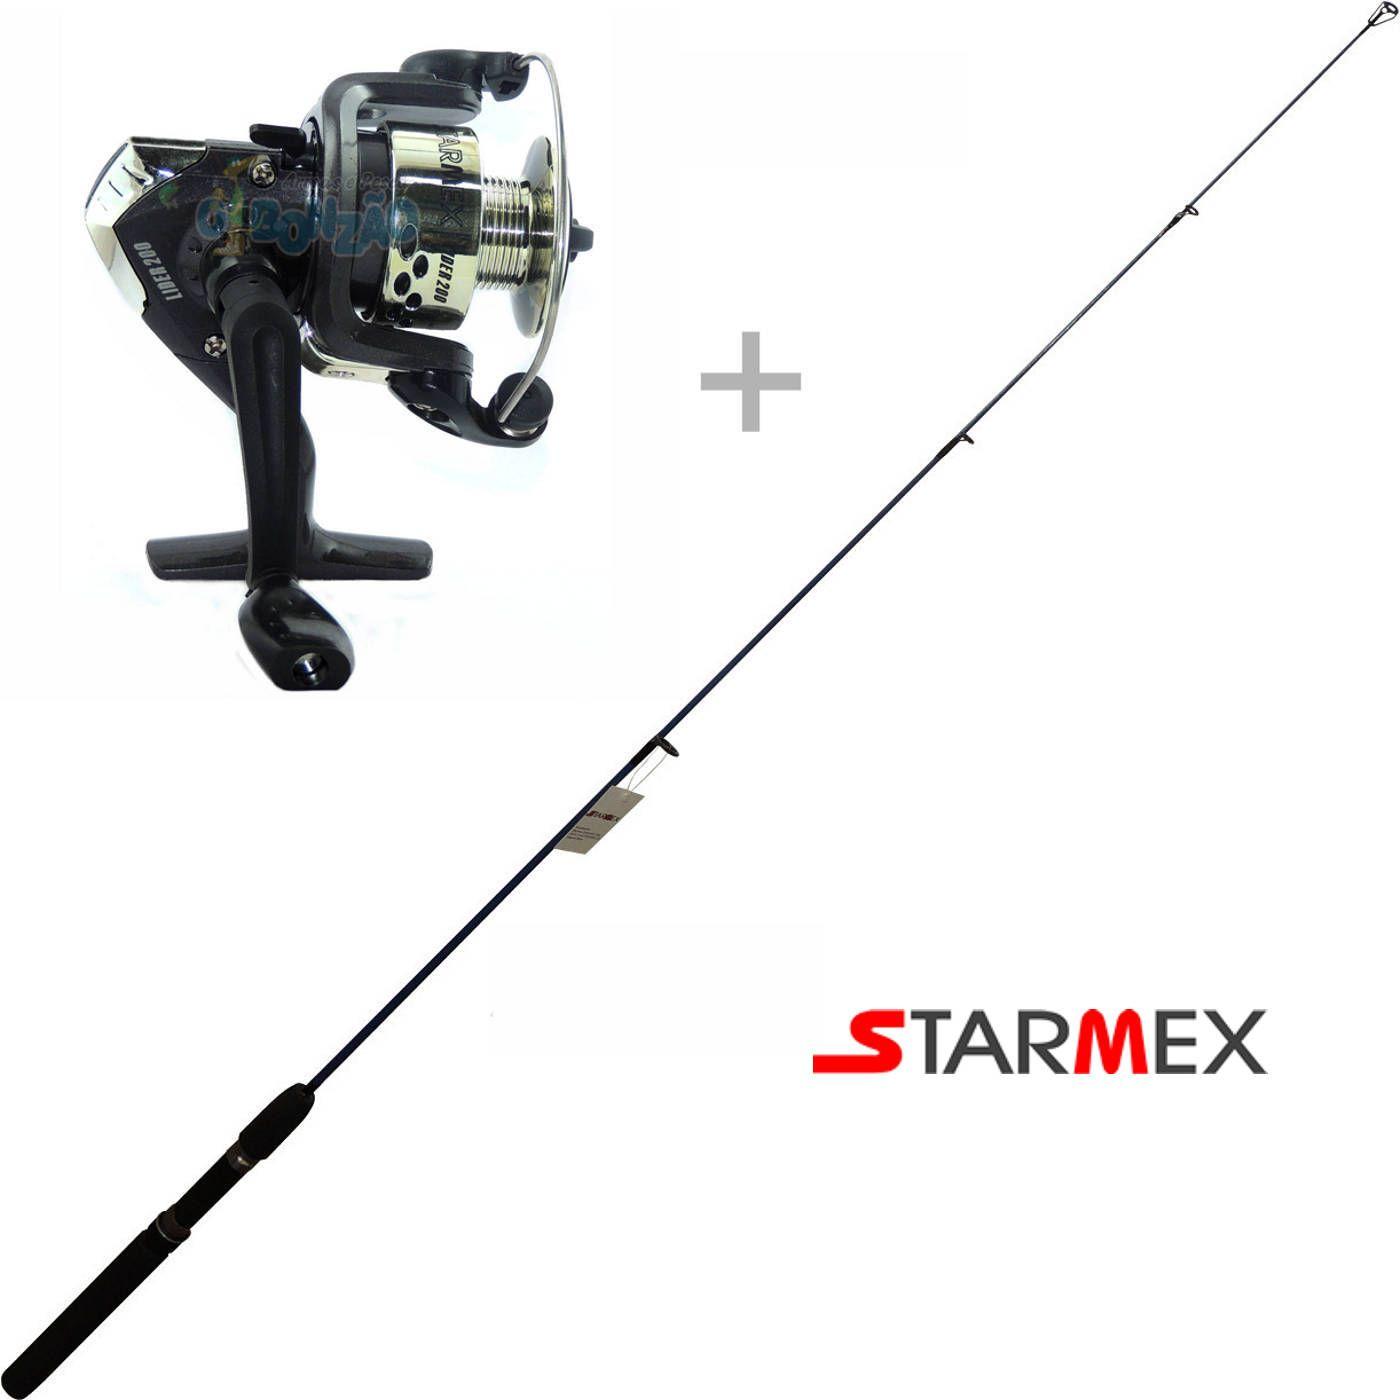 Kit de Pesca Vara Abella Spin 1,35m + Molinete Lider 200 - Starmex